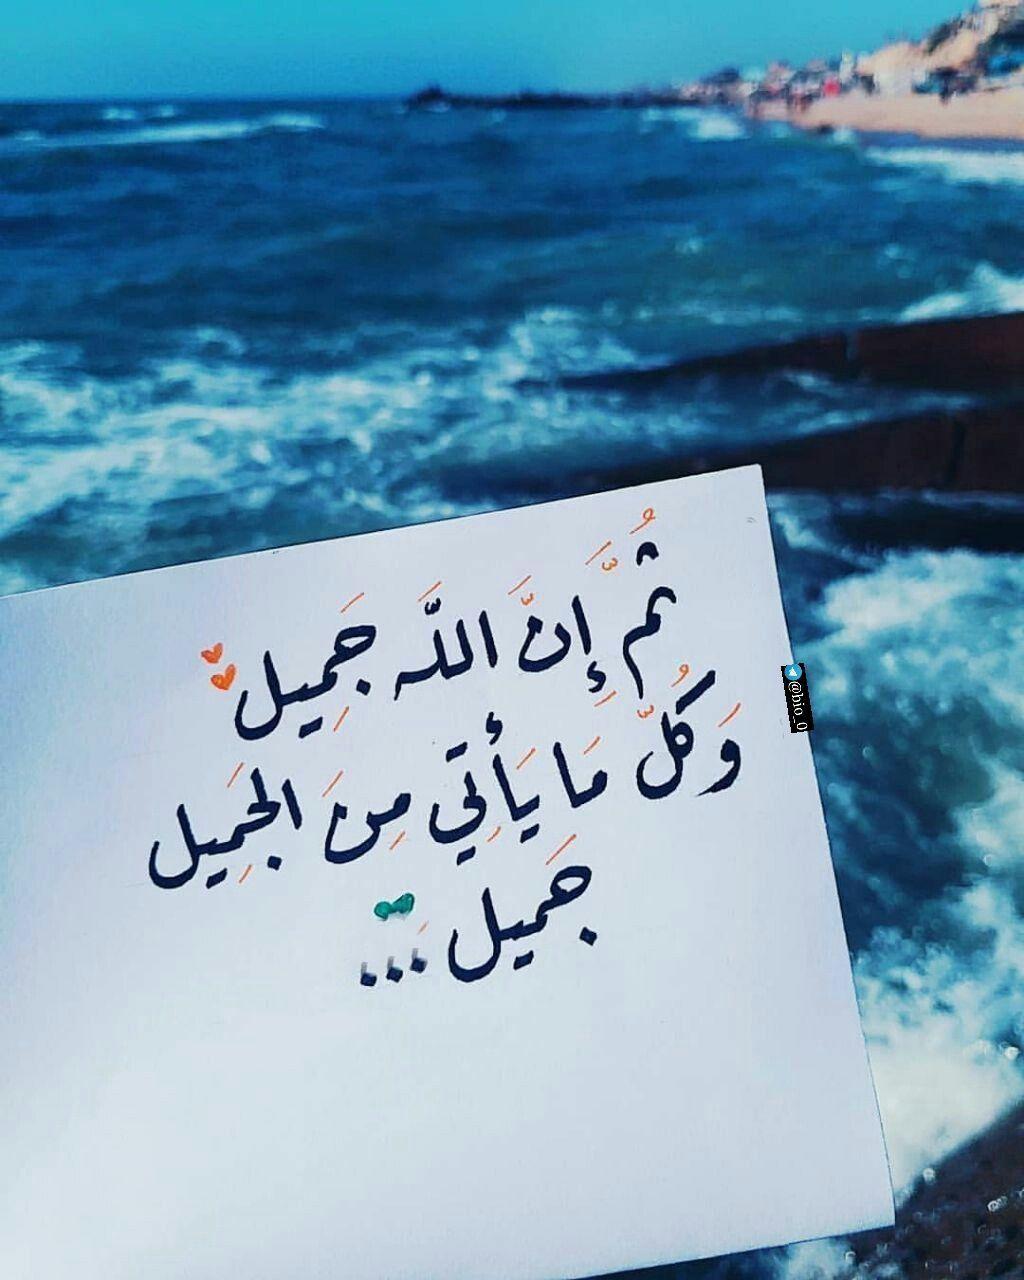 ثم إن الله جميل وكل ما يأتي من الجميل جميل Proverbs Quotes Arabic Quotes Postive Quotes